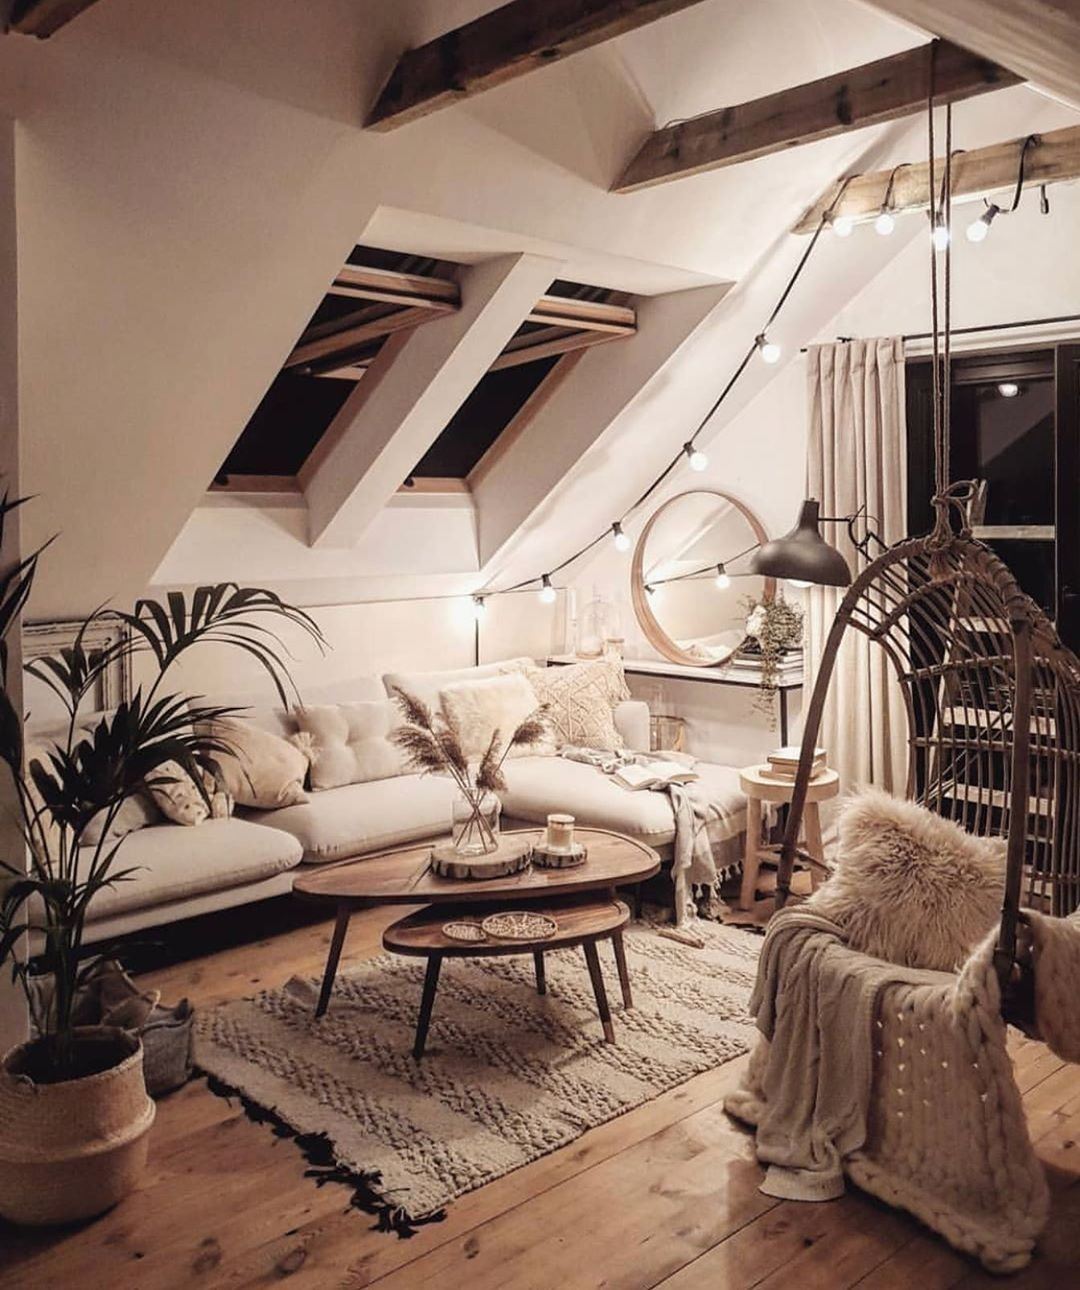 New Stylish Bohemian Home Decor and Design Ideas #guidesign